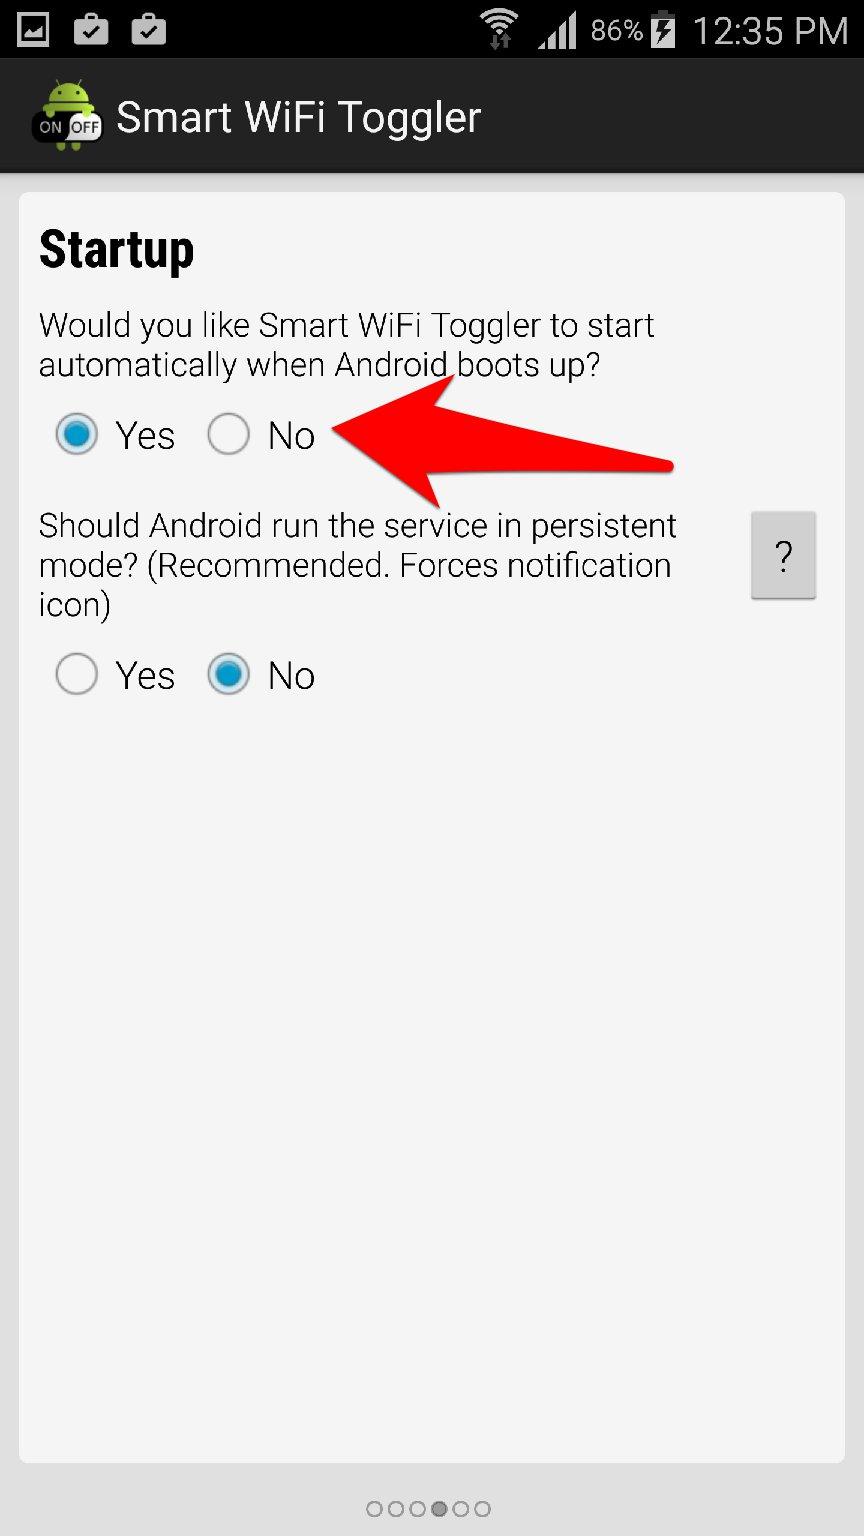 Smart WiFi Toggler تطبيق ذكي لتوفير حزمة البيانات وبطارية جوالك | بحرية درويد